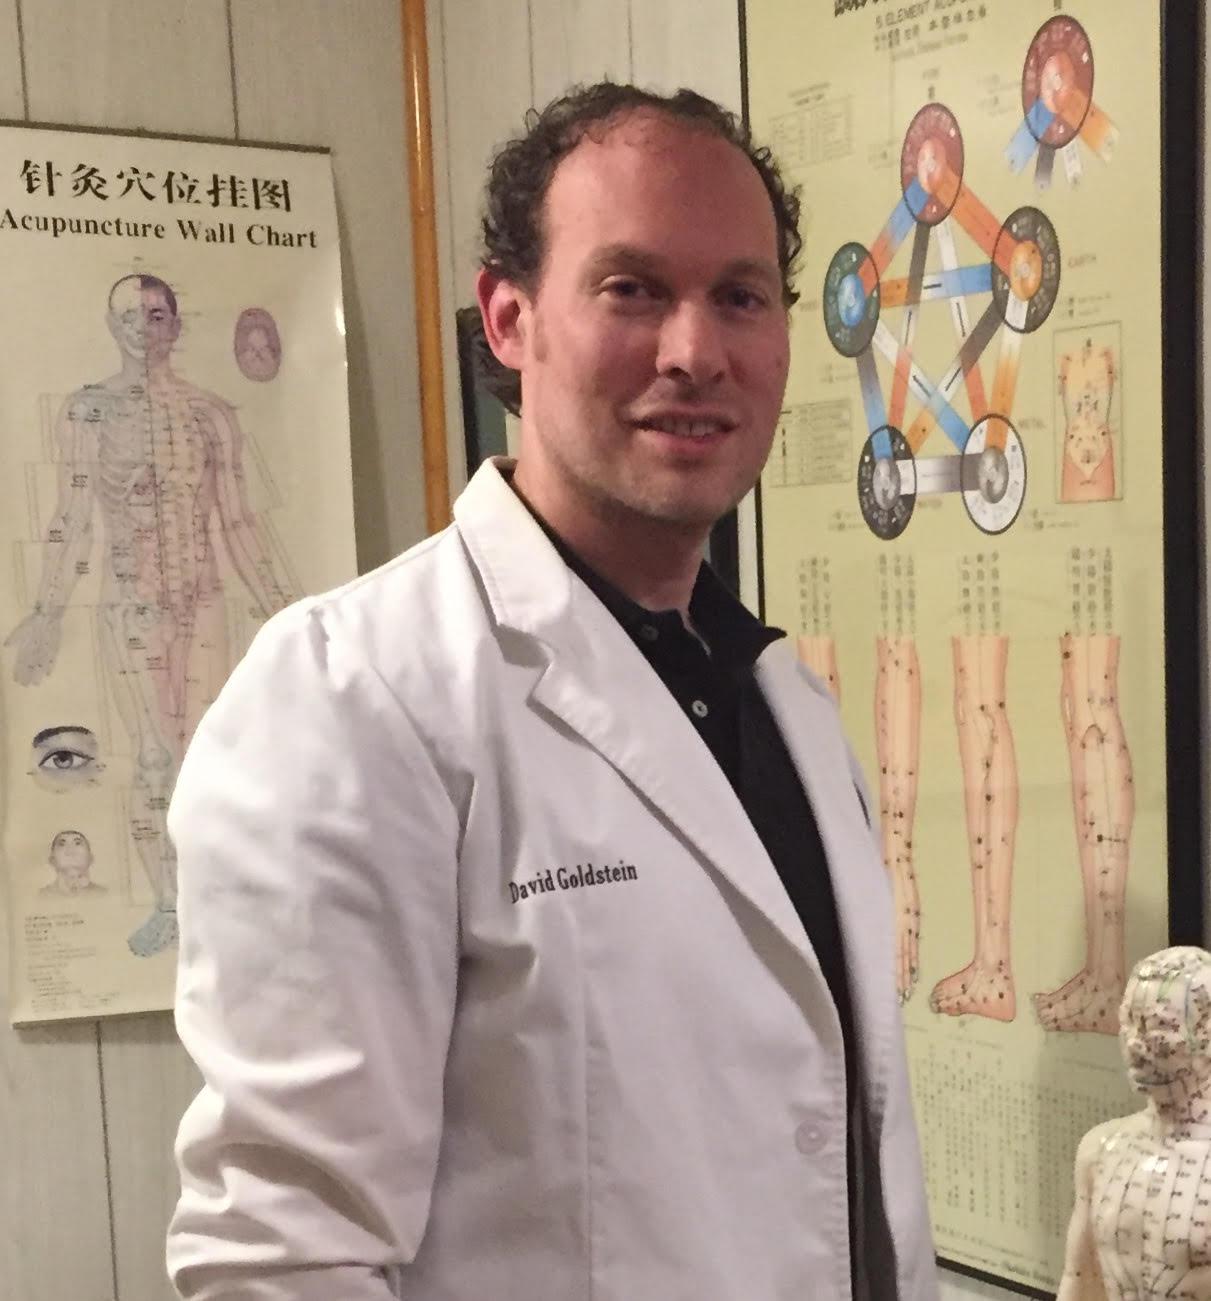 David Goldsten, LAc, Herbalist